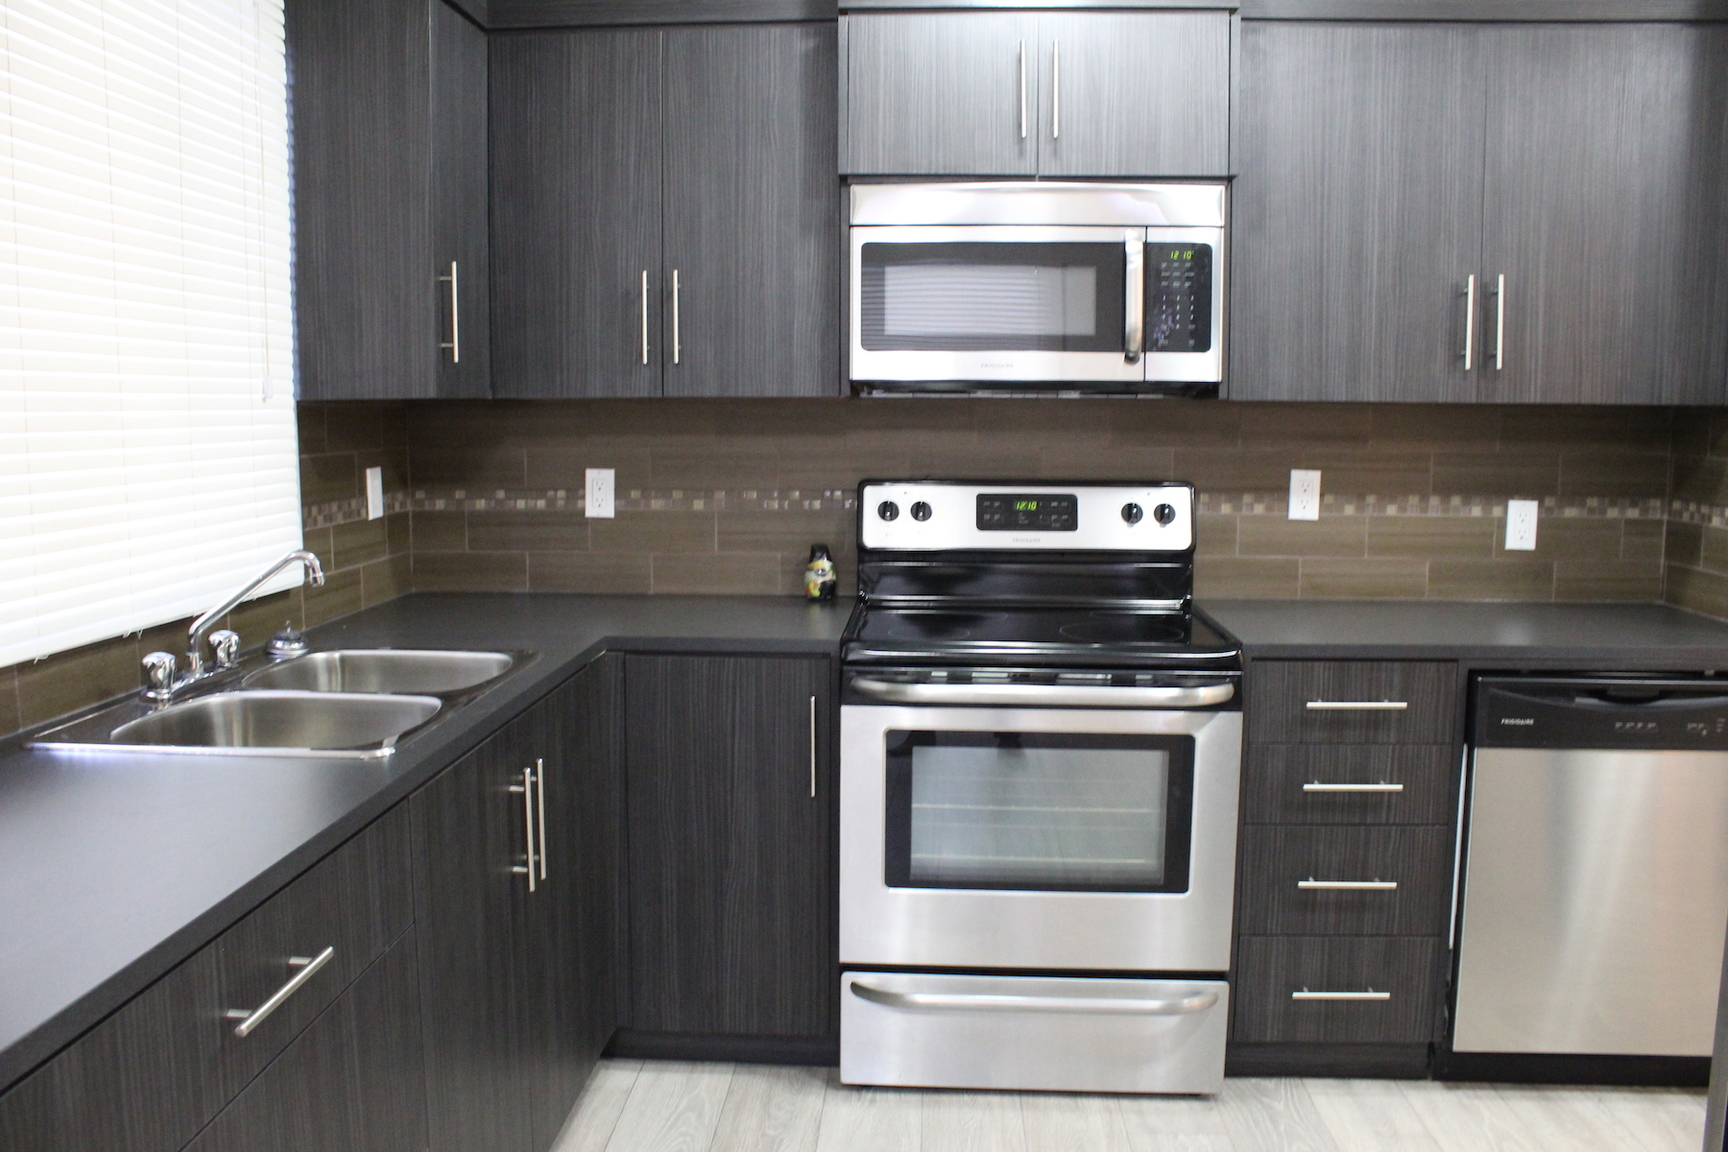 520 5 St NE, Calgary, AB - $1,300